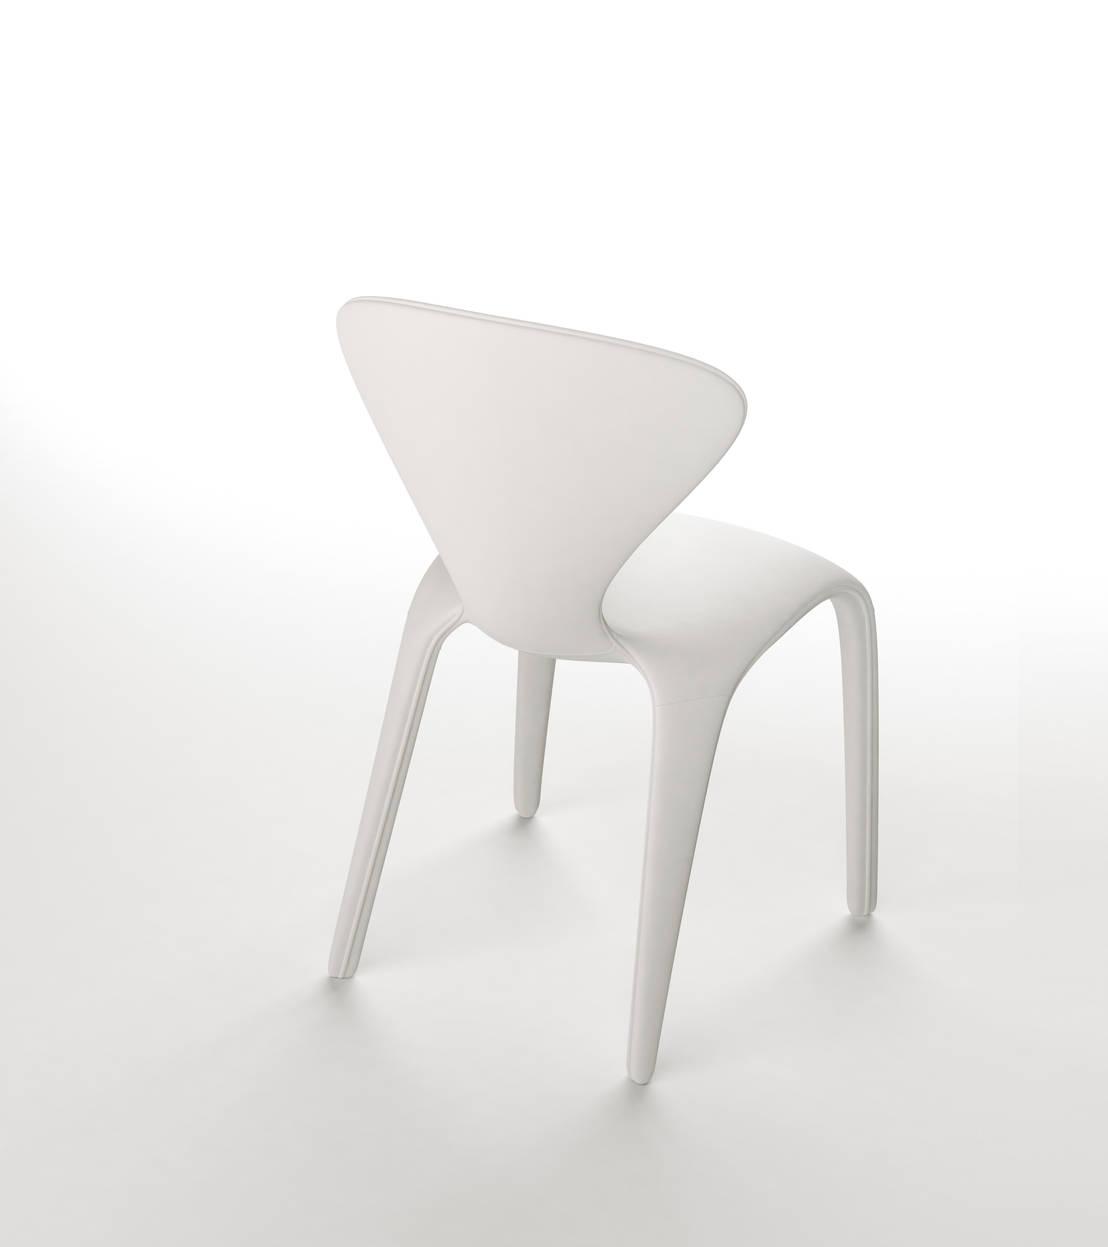 la chaise marilyn de sacha lakic homify. Black Bedroom Furniture Sets. Home Design Ideas